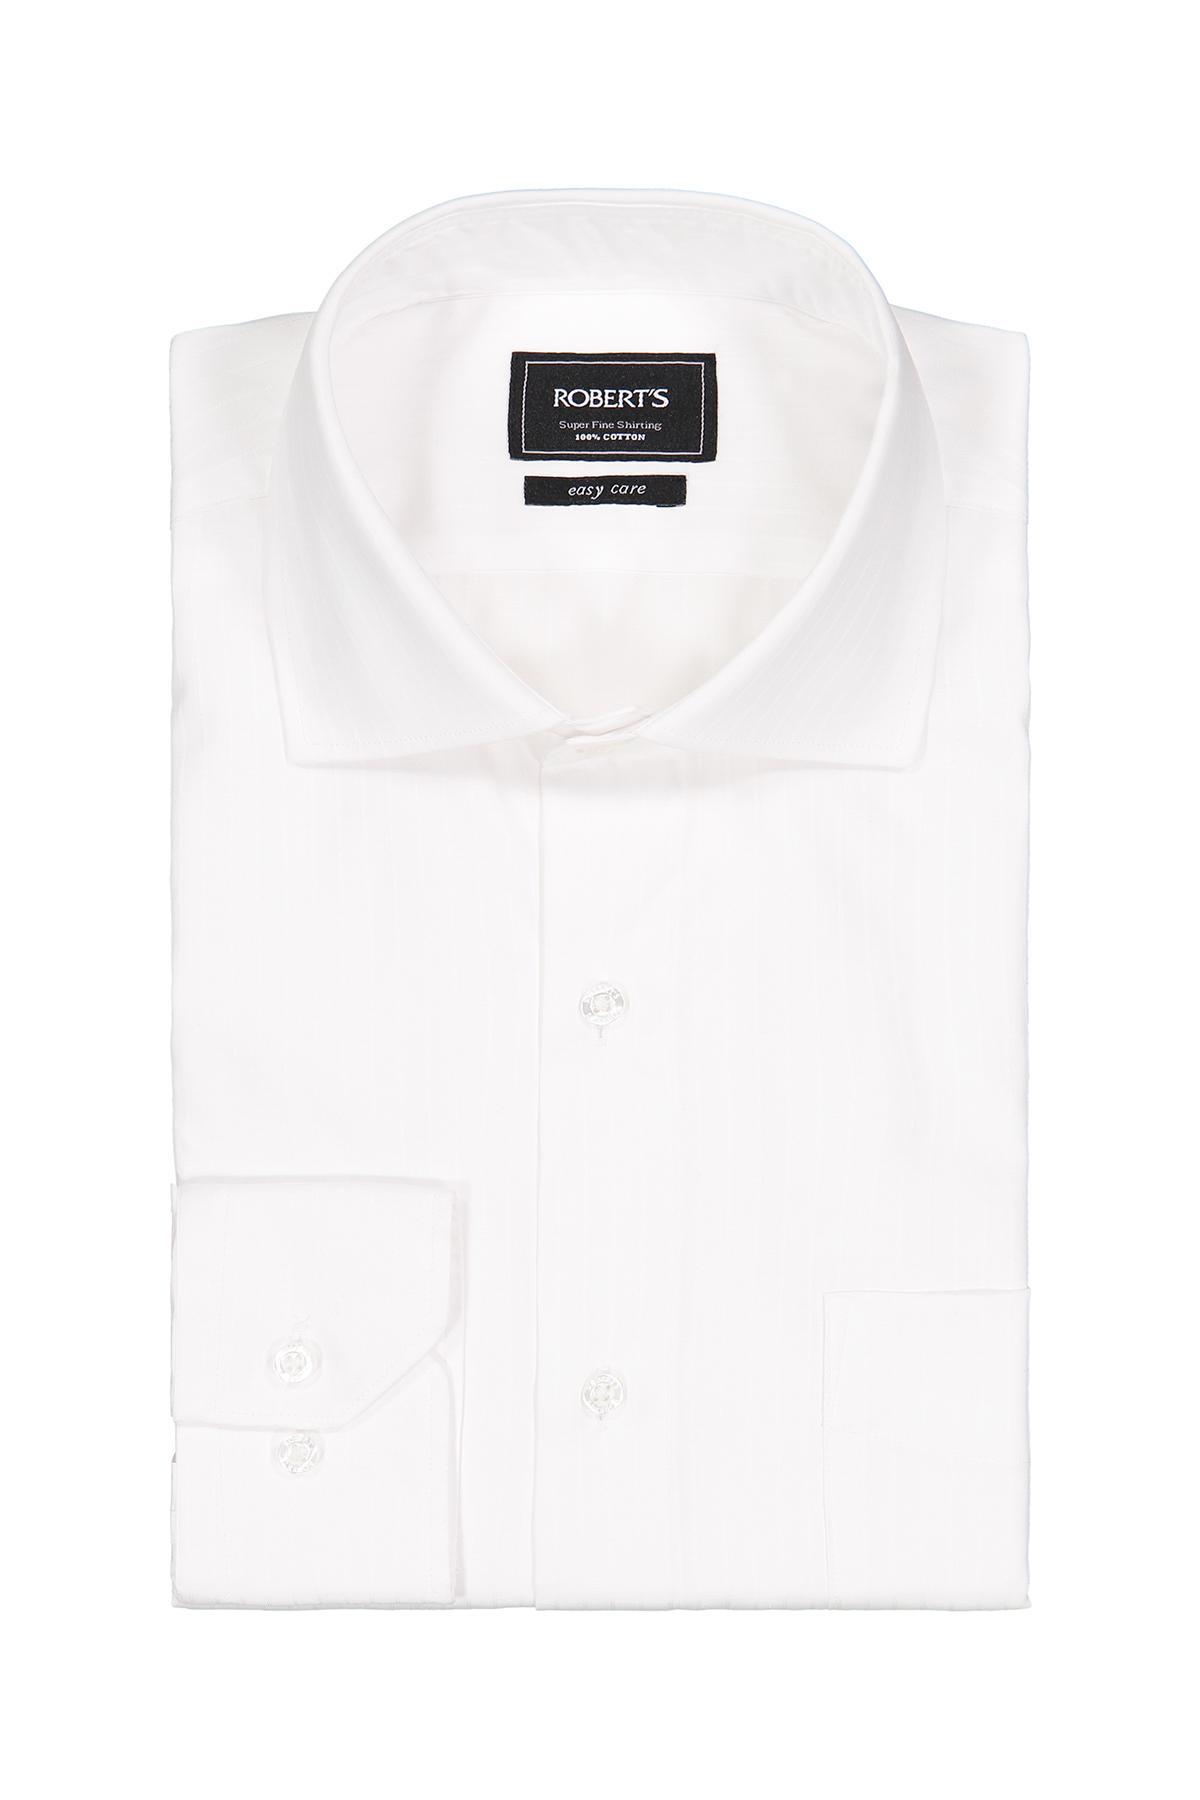 Camisa Robert´s, Easy Care, blanca trama vertical, cuello italiano.